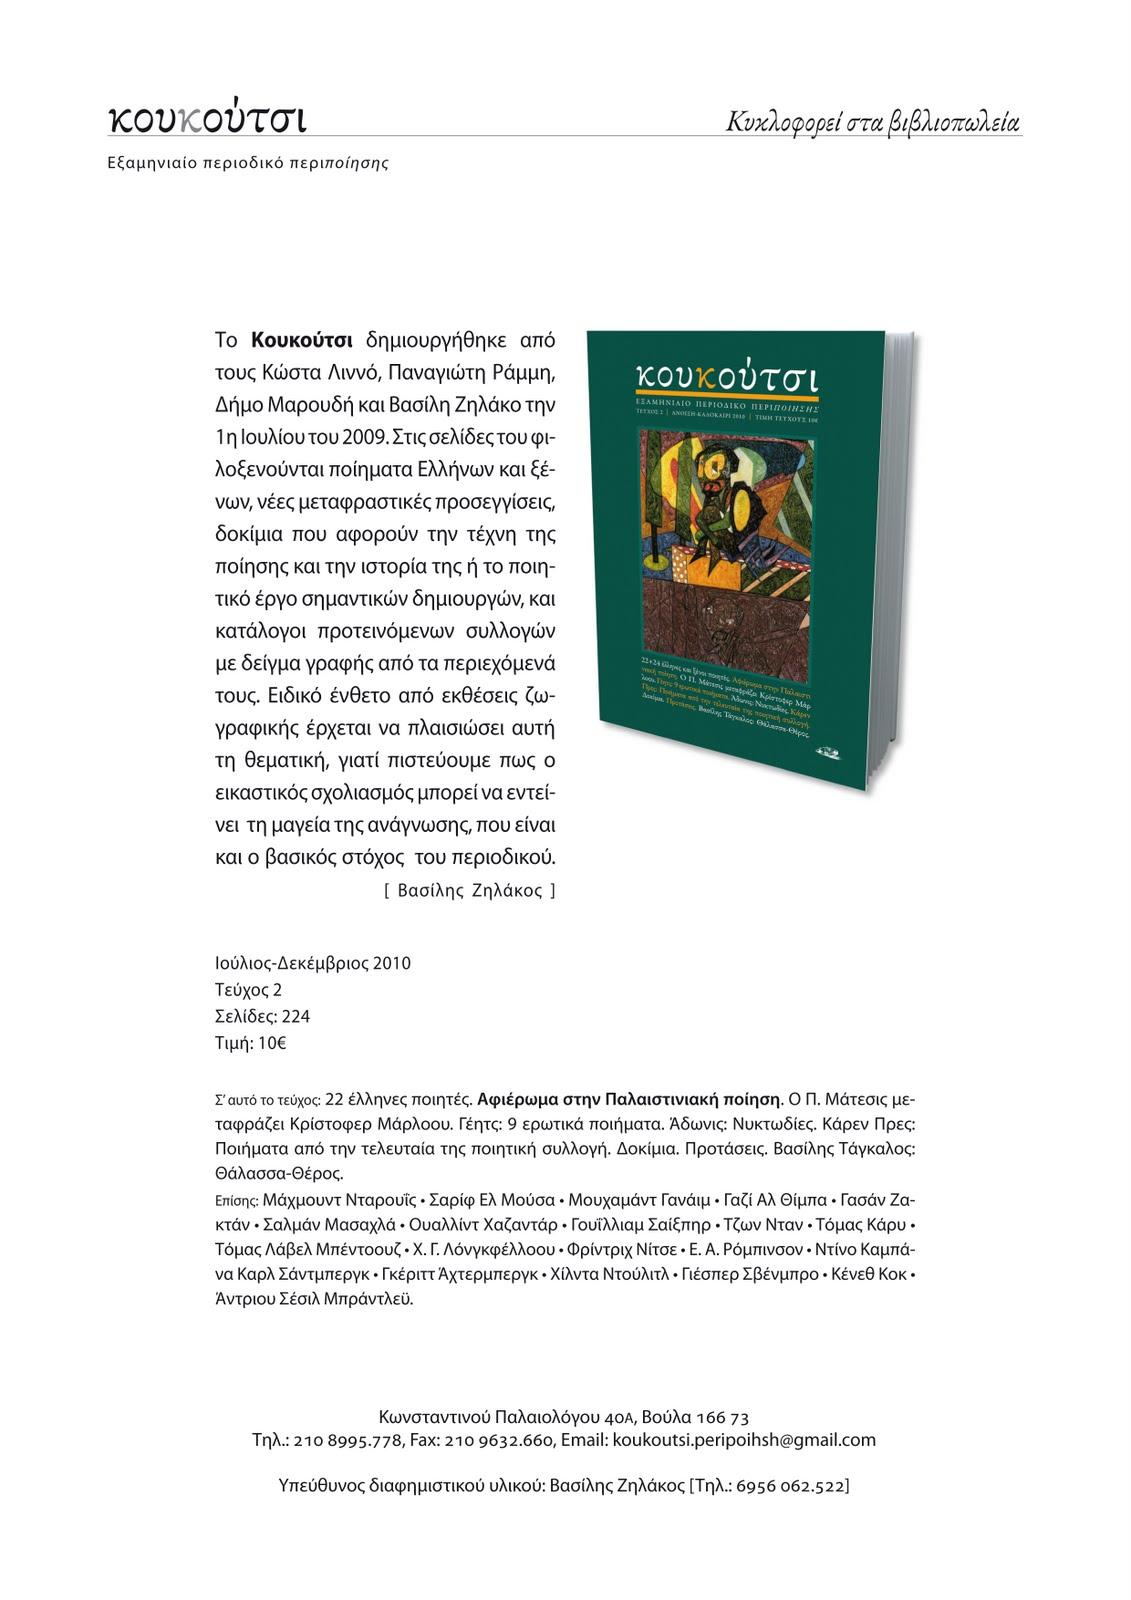 1481dfcfdb13 Λογοτεχνικά Επίκαιρα  Περιοδικό ΚΟΥΚΟΥΤΣΙ τχ.2 (νέο τεύχος)